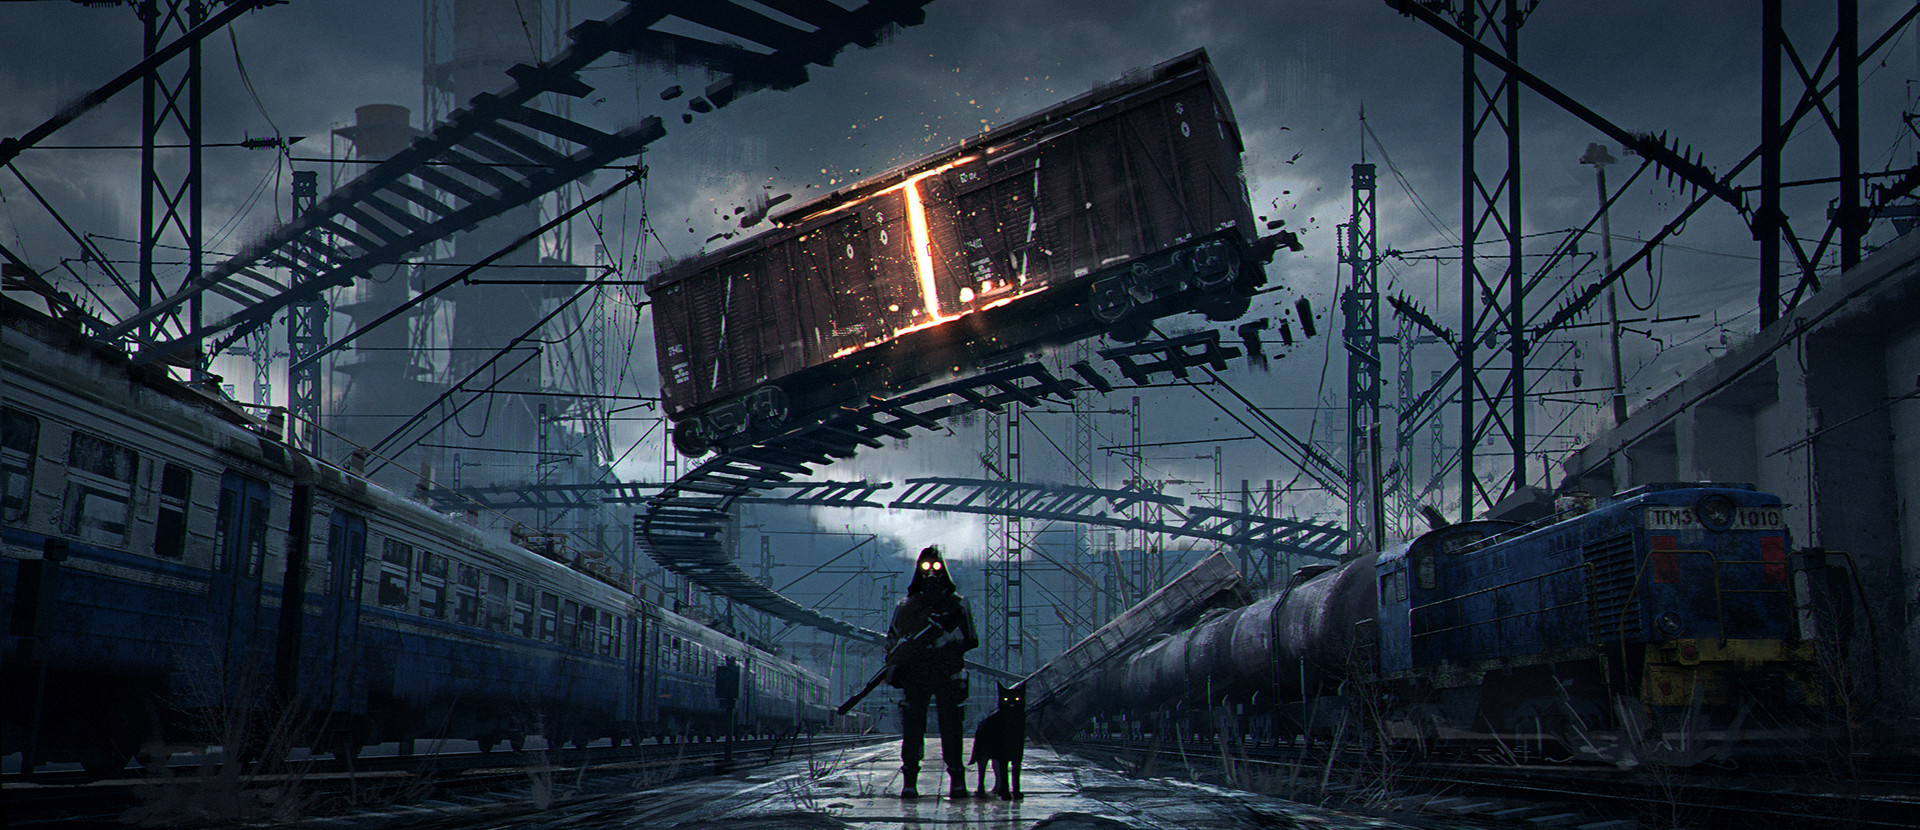 clouds dark gas masks artwork surreal apocalyptic digital art train dog science fiction sky standing concept art rifles environment